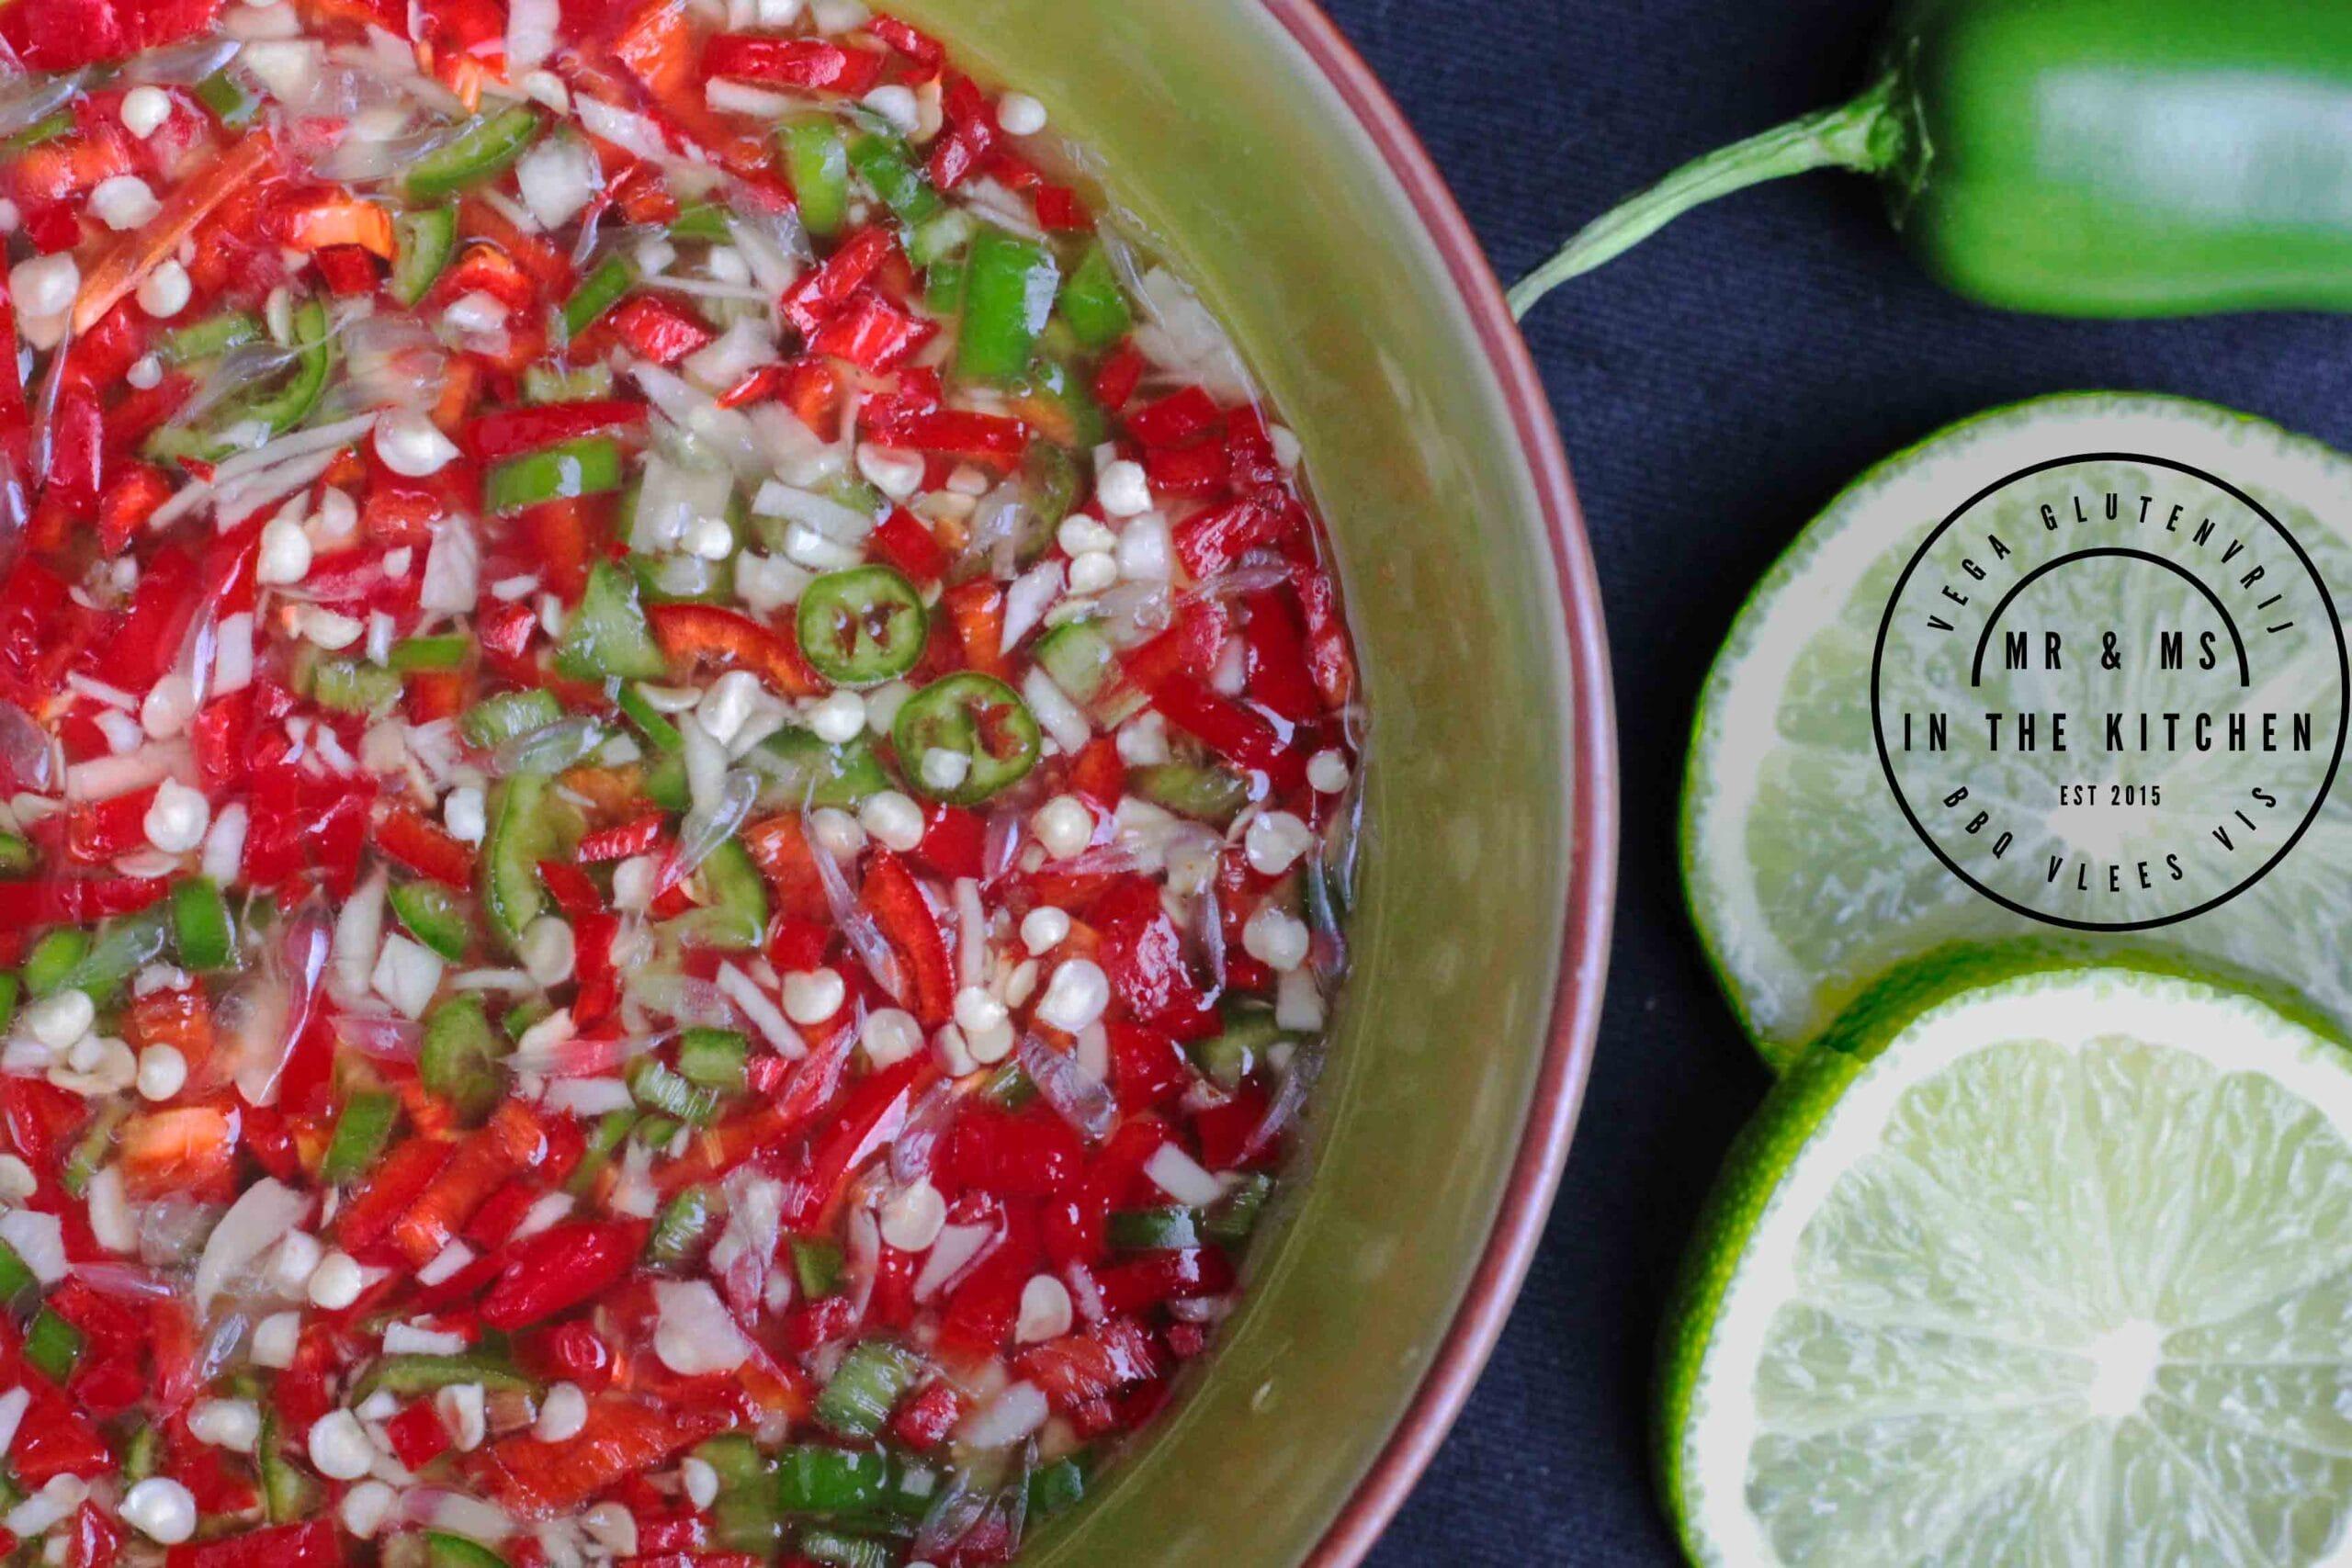 Thaise dipsaus: Nam pla prik vis saus heet peper pepers Thailand Thai Thais Thaise knoflook limoen suiker recept mr and ms in the kitchen